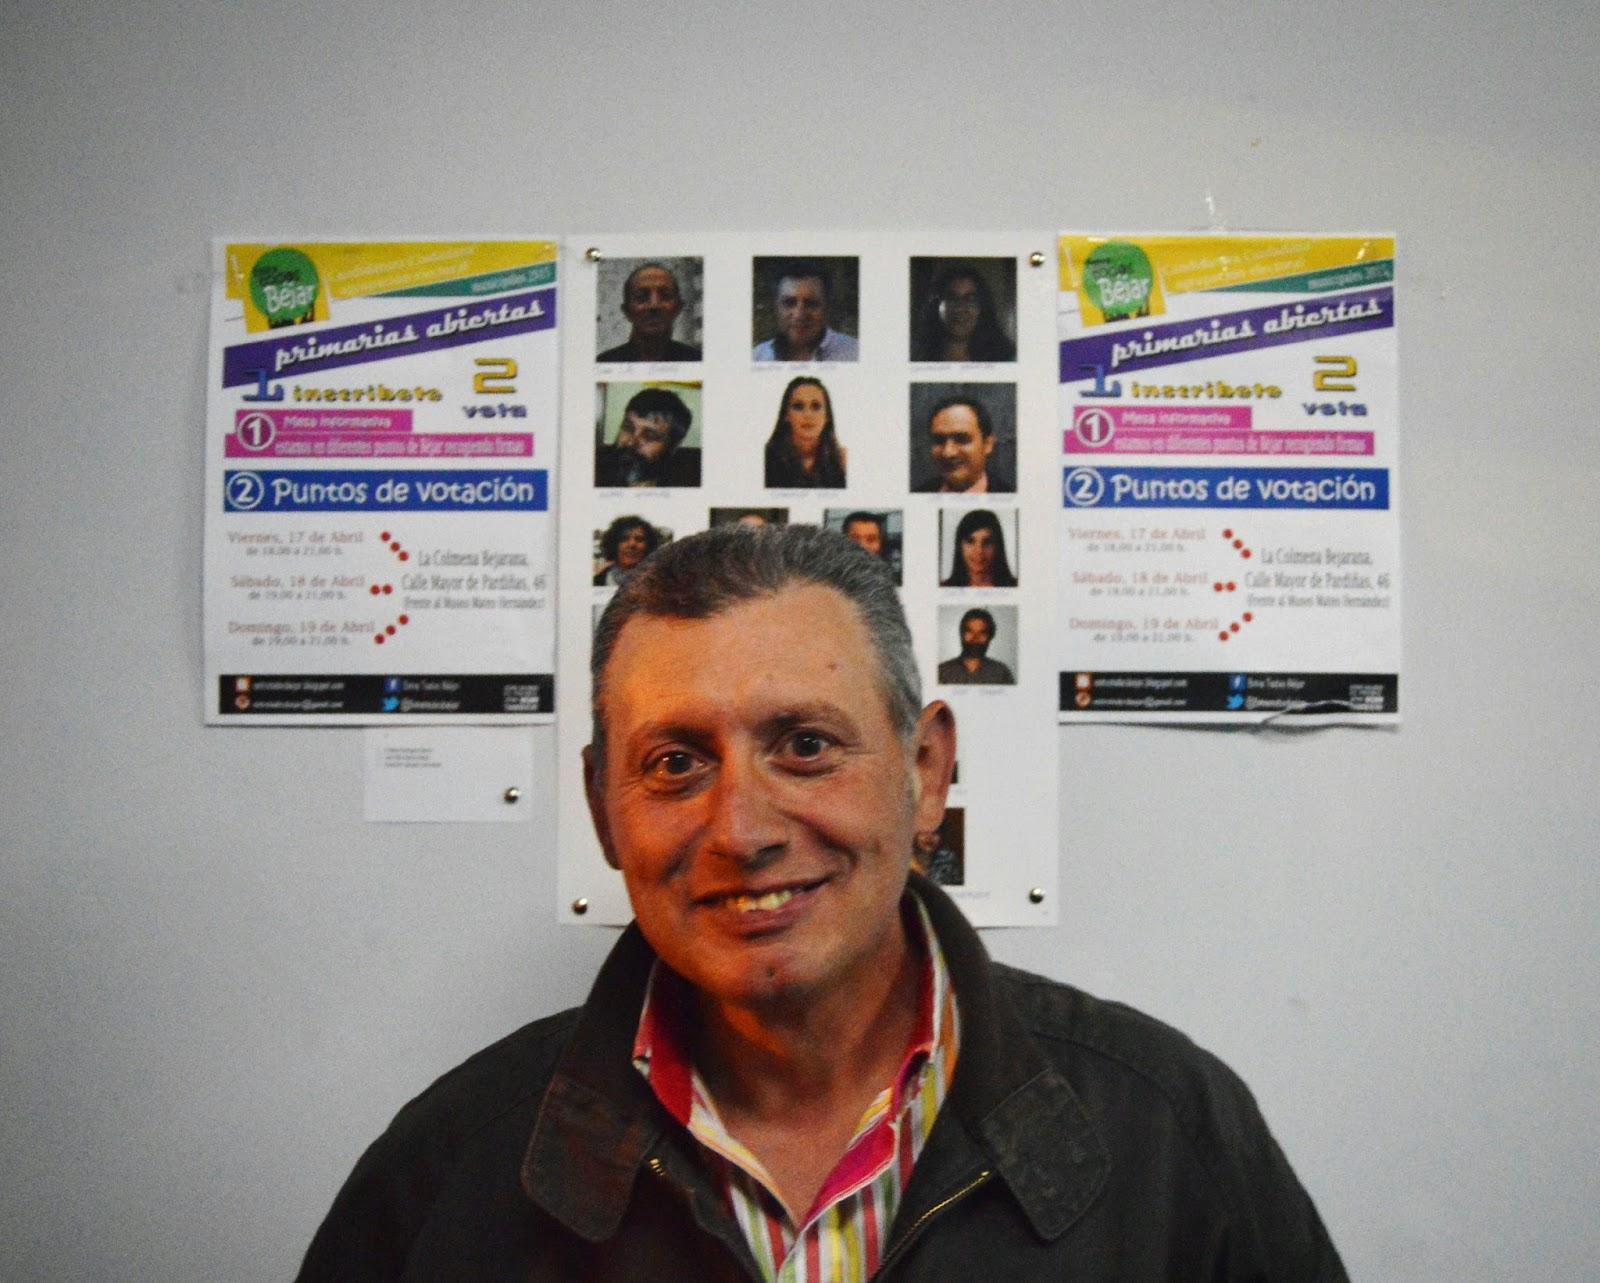 Francisco Javier Yuste Hernández.